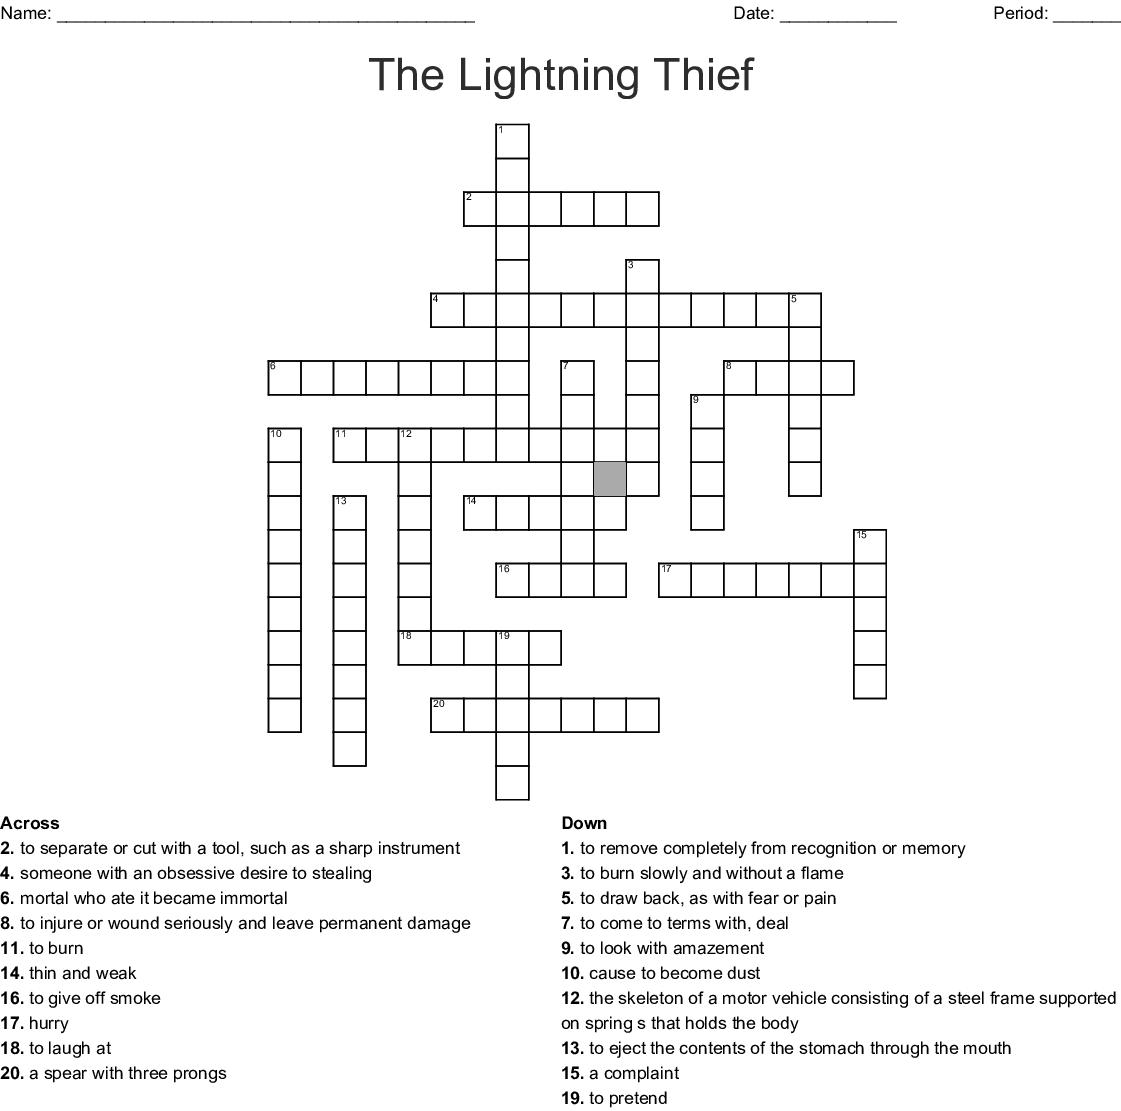 The Lightning Thief Crossword Puzzle